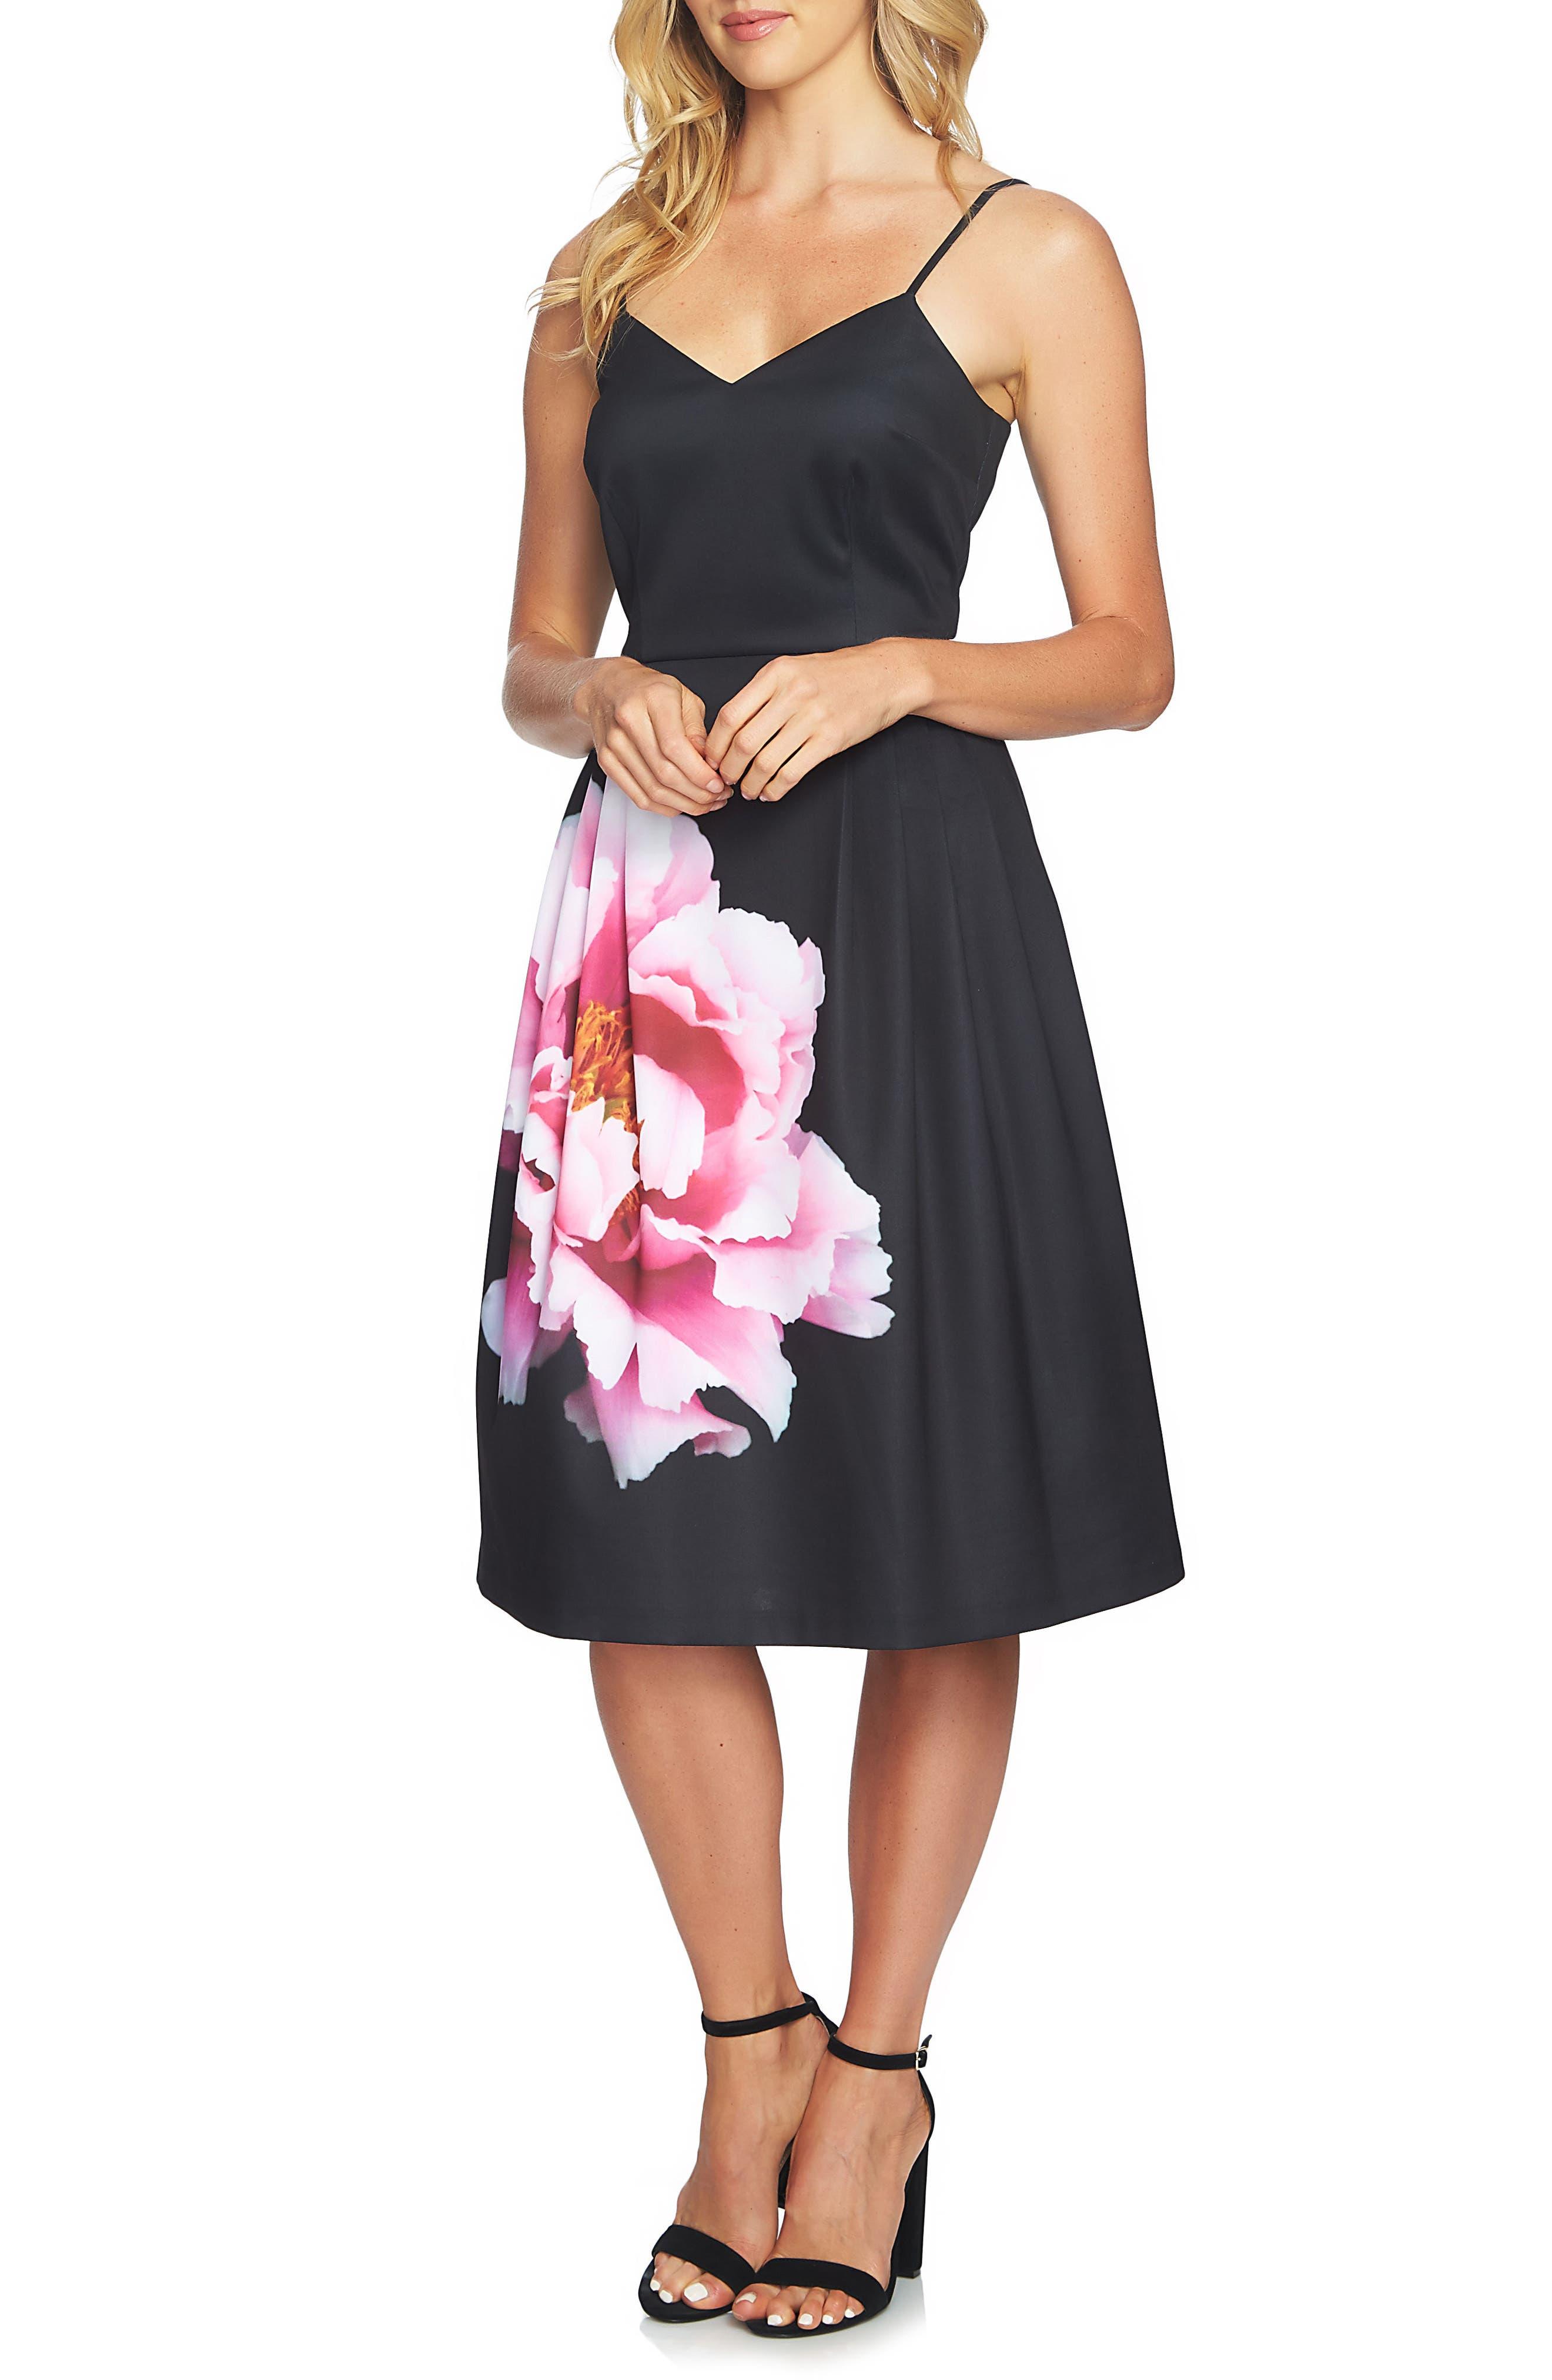 Alternate Image 1 Selected - CeCe Leah Pleated A-Line Dress